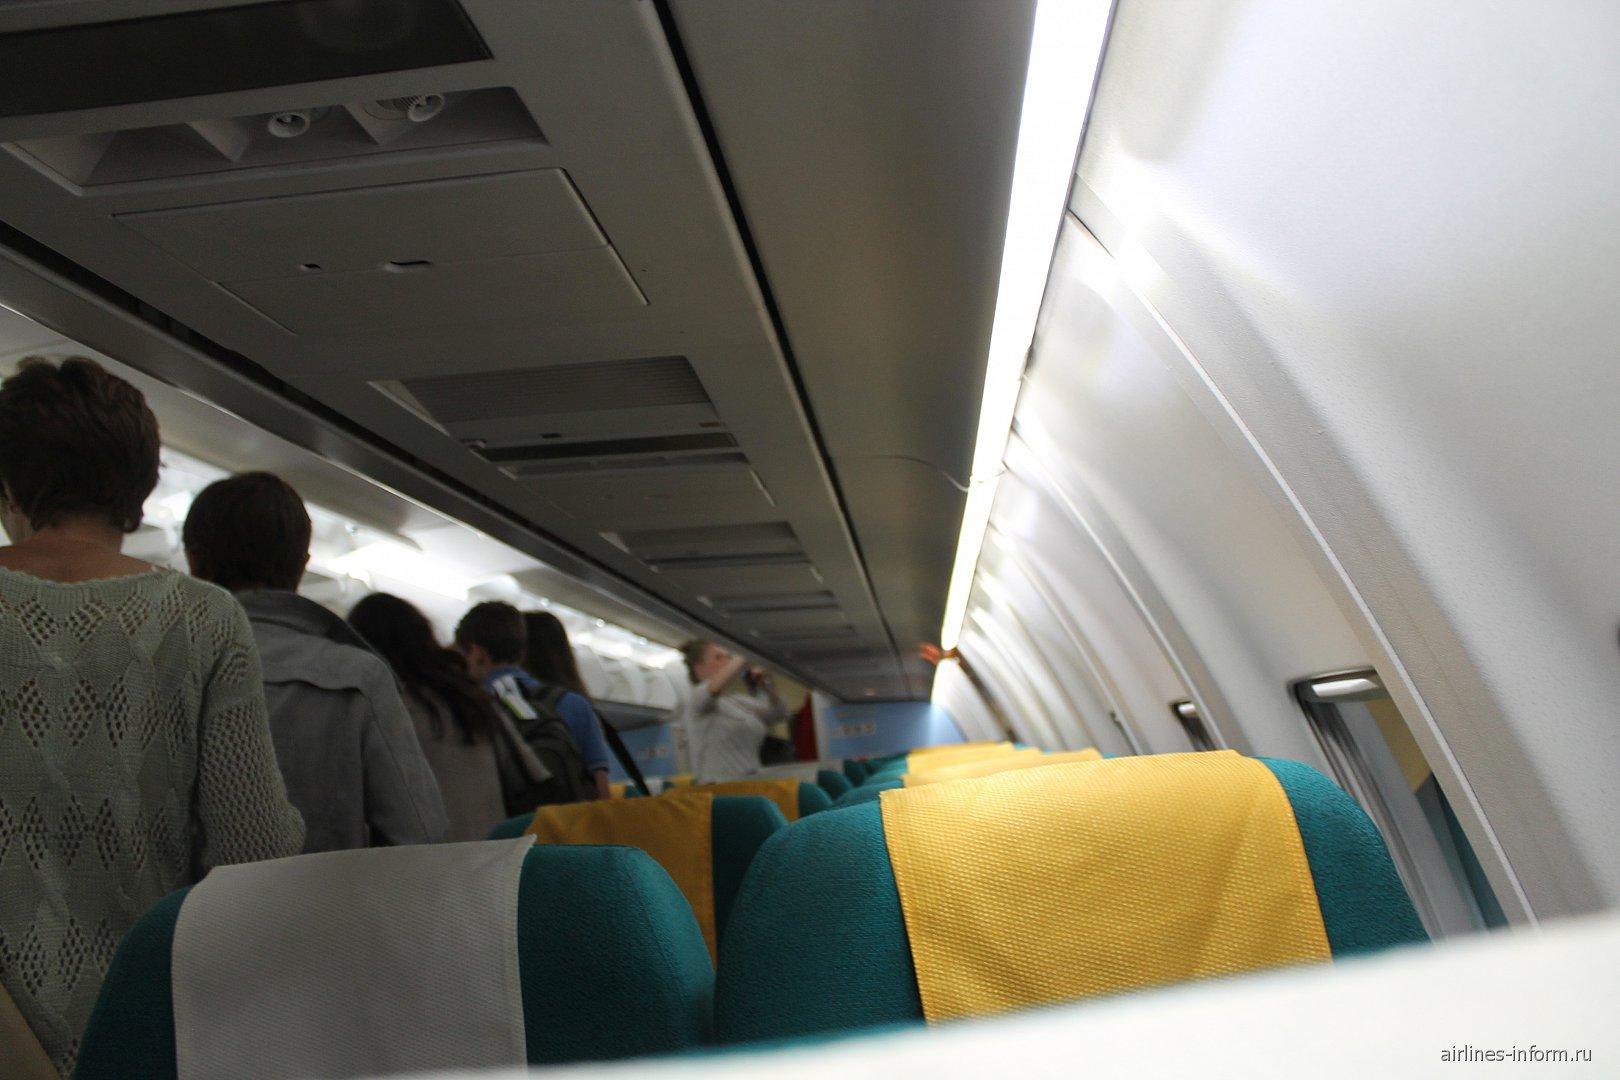 Салон самолета Фоккер-70 Австрийских авиалиний